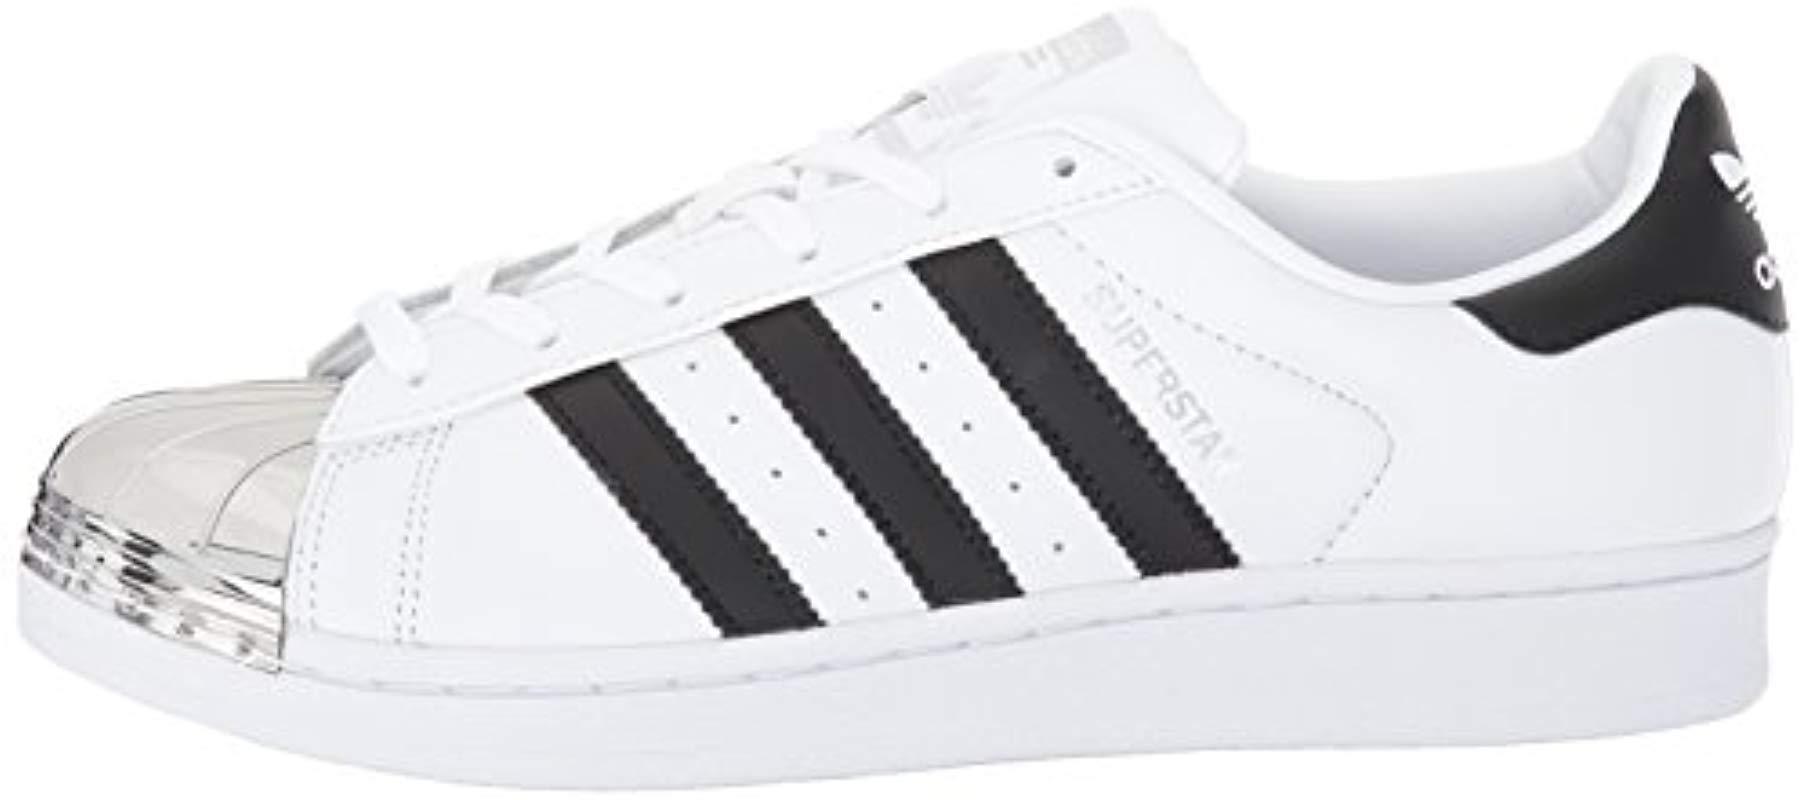 adidas Originals Leather Superstar Metal Toe W Skate Shoe Running ...